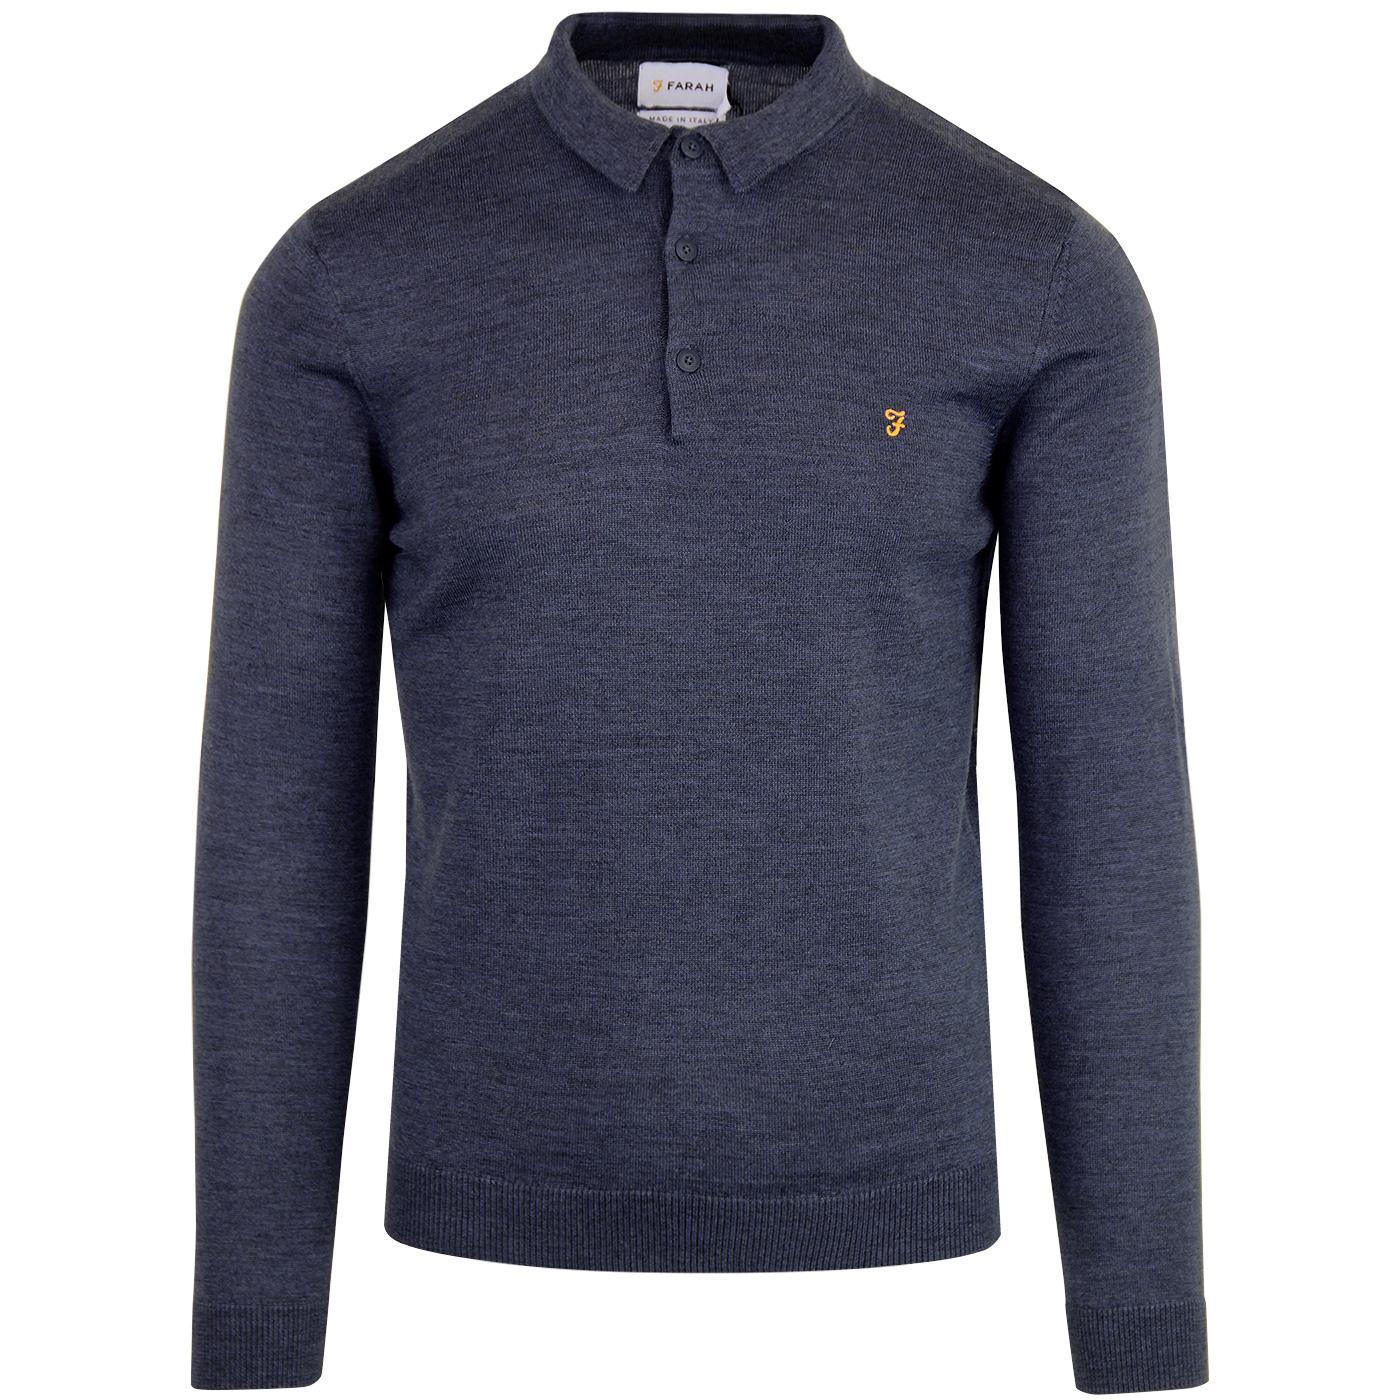 Maidwell FARAH 60s Mod Knitted Wool Polo BLUE MARL